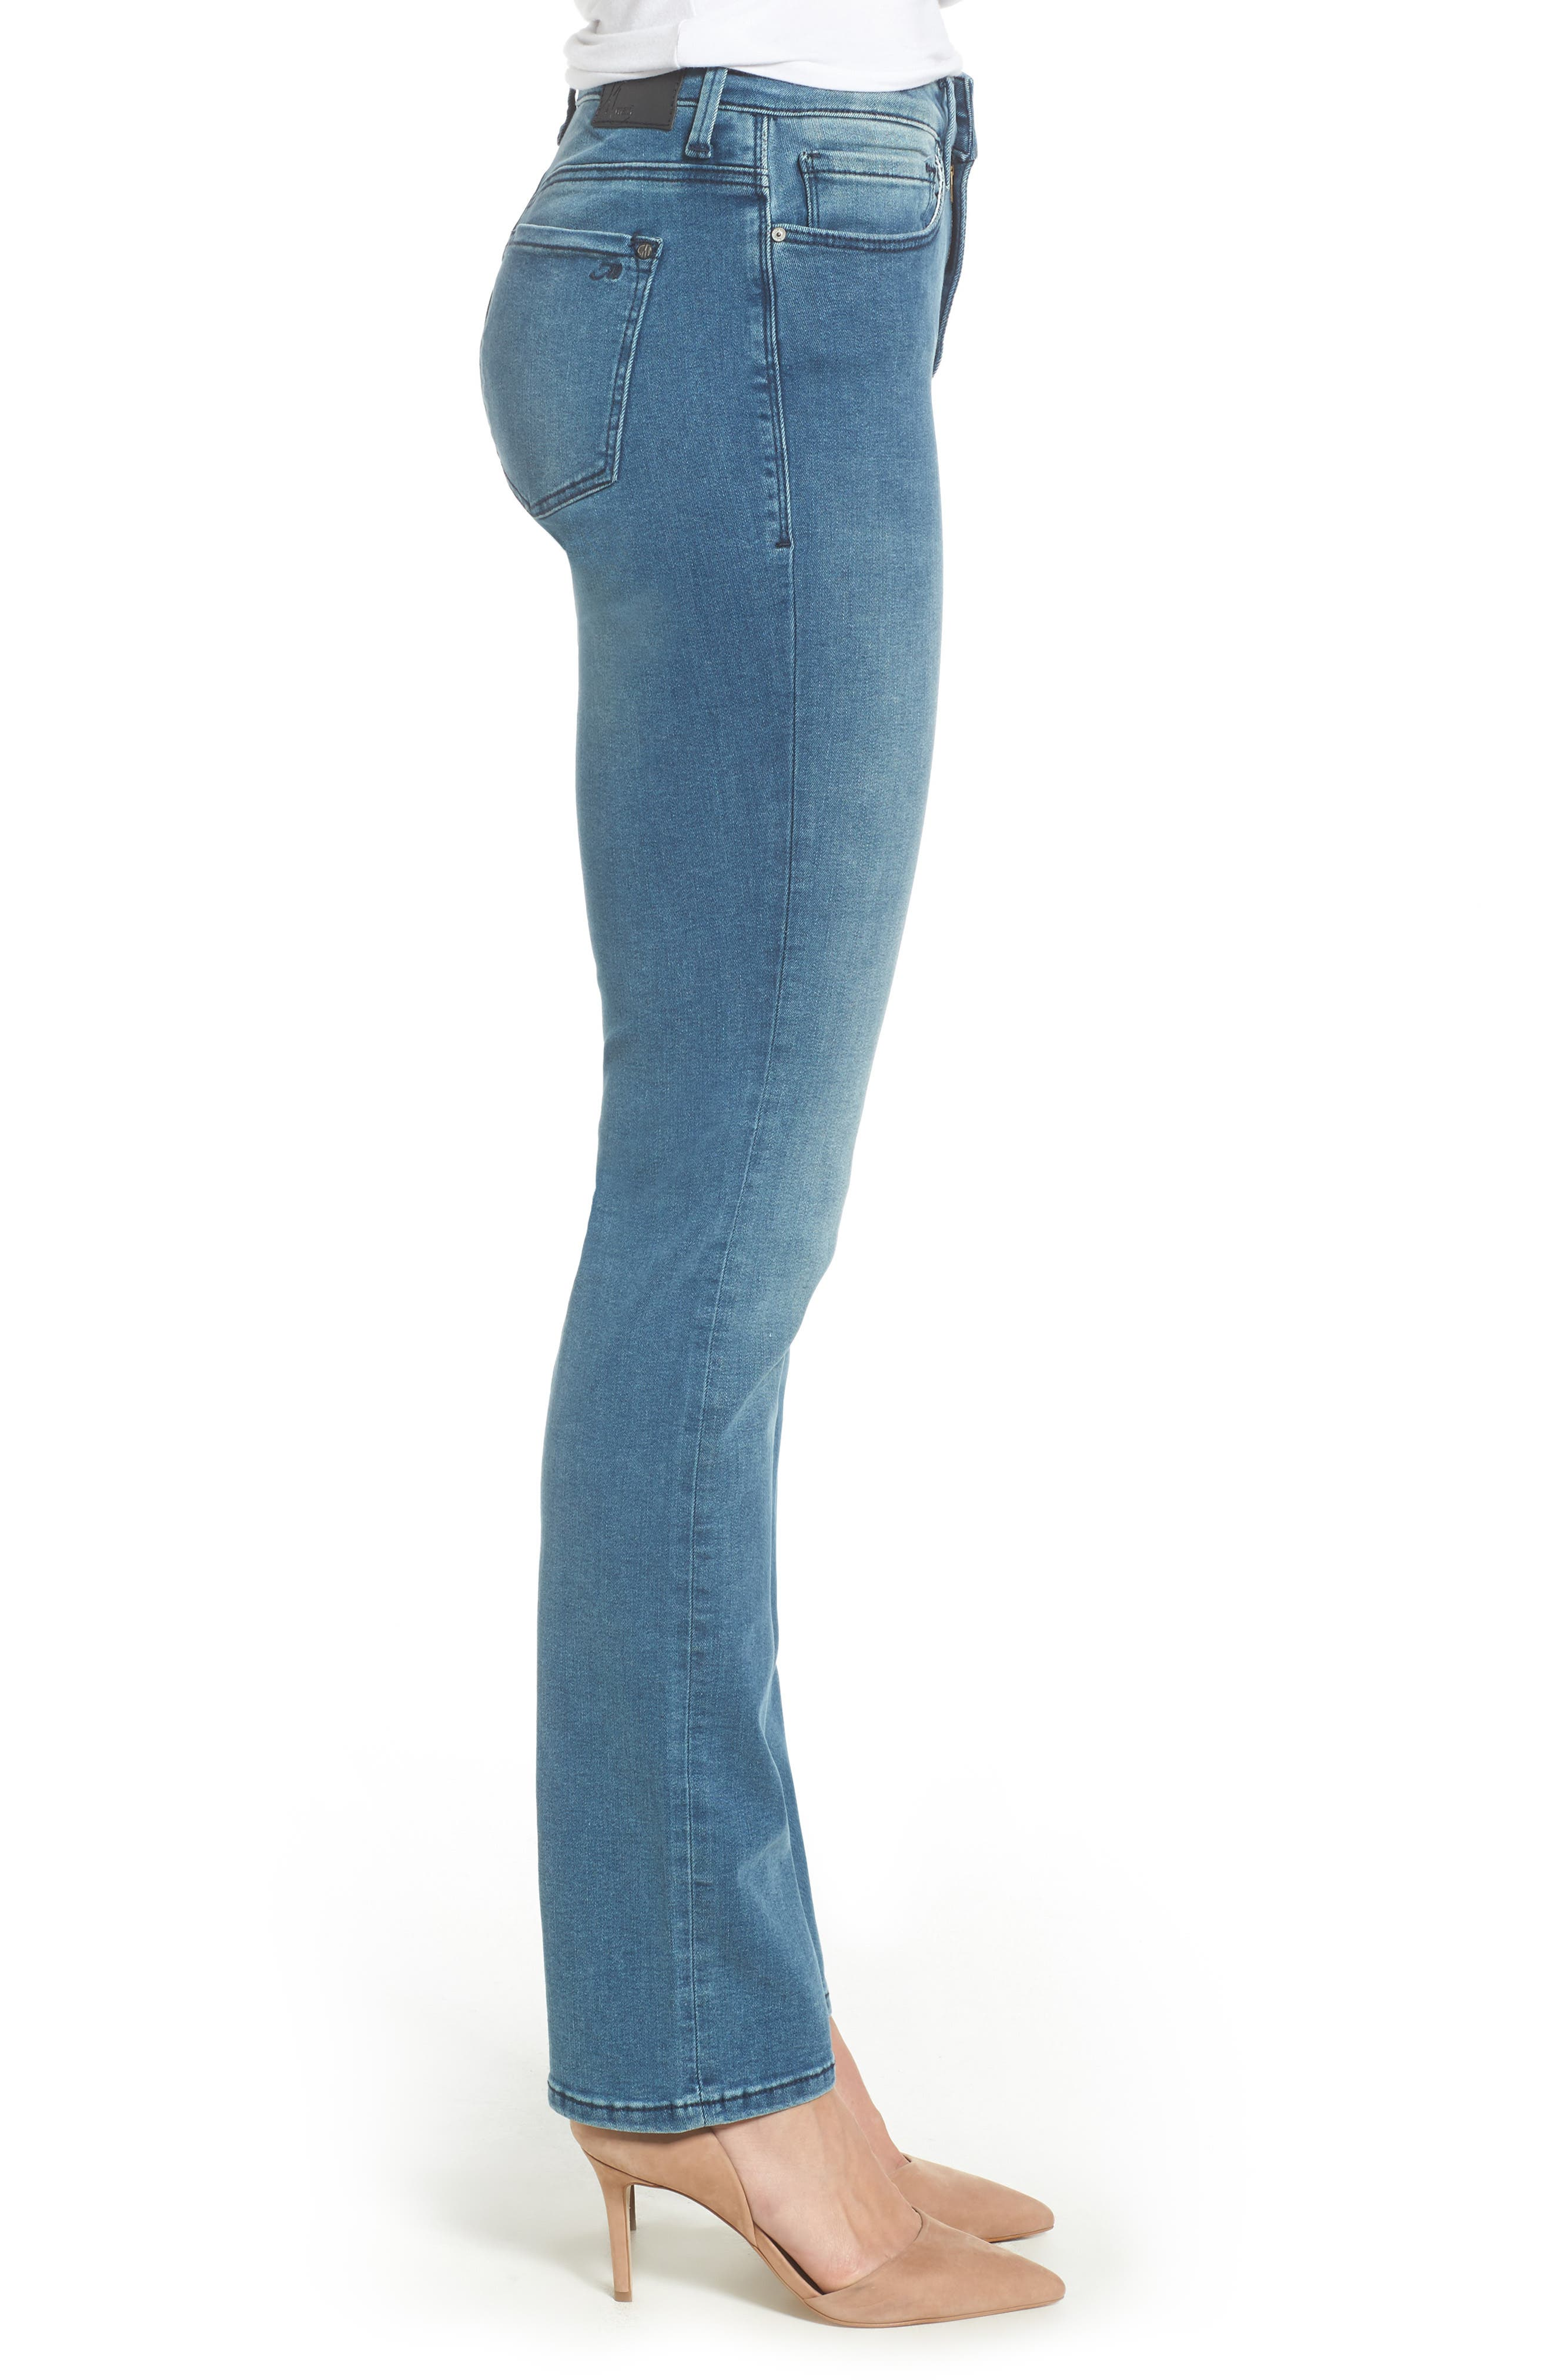 Kendra High Waist Straight Leg Jeans,                             Alternate thumbnail 3, color,                             420